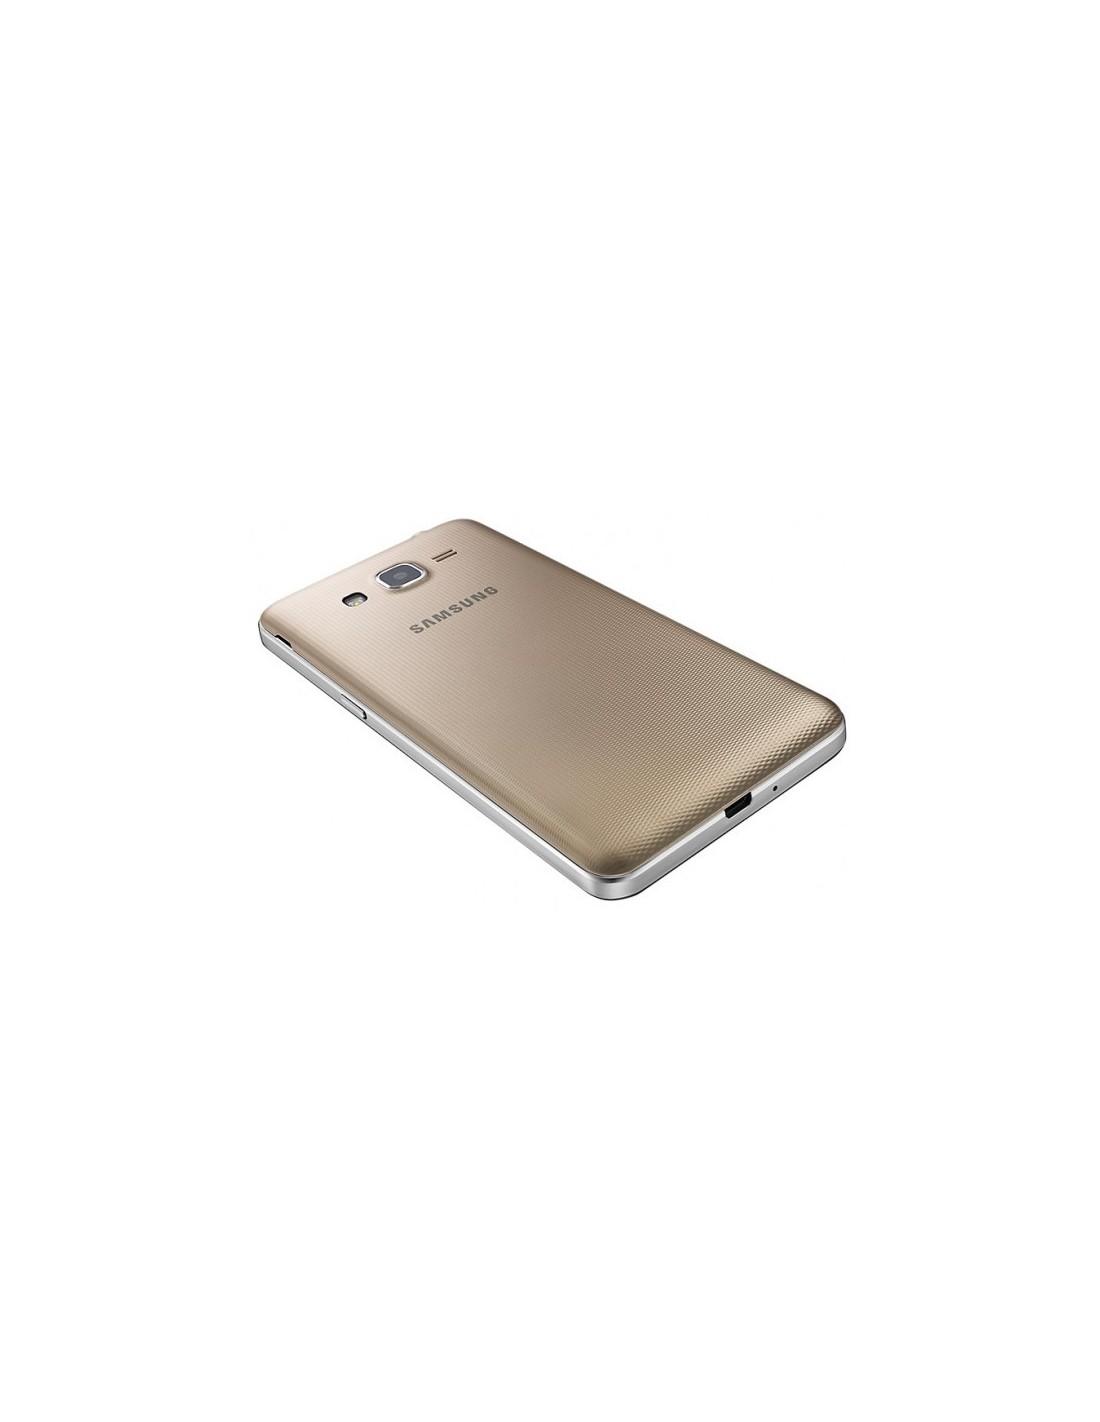 Prix Telephone Portable Samsung Galaxy Grand Prime Plus 4g